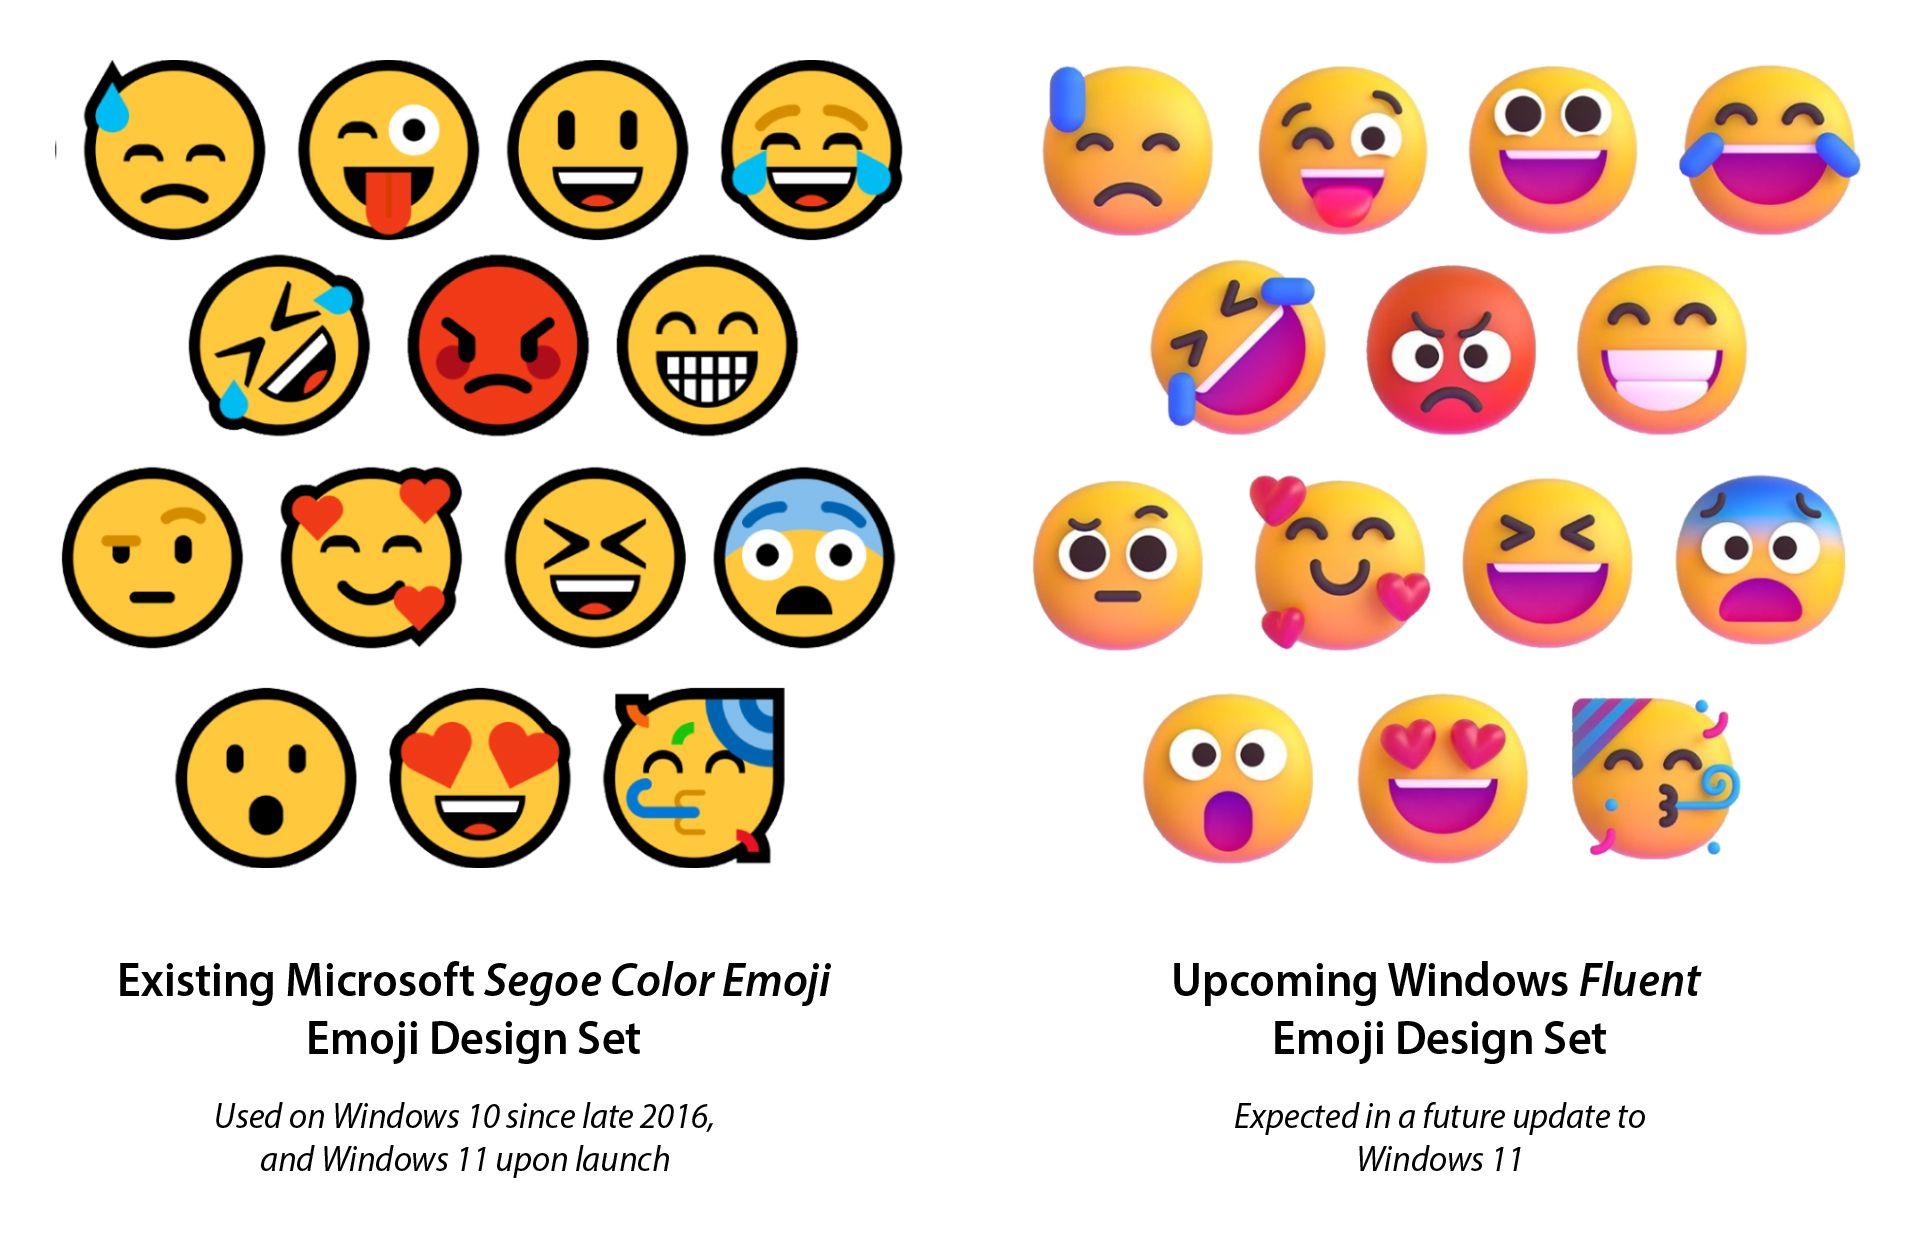 Emojipedia-Windows-11-Launch-Segoe-Fluent-Comparison